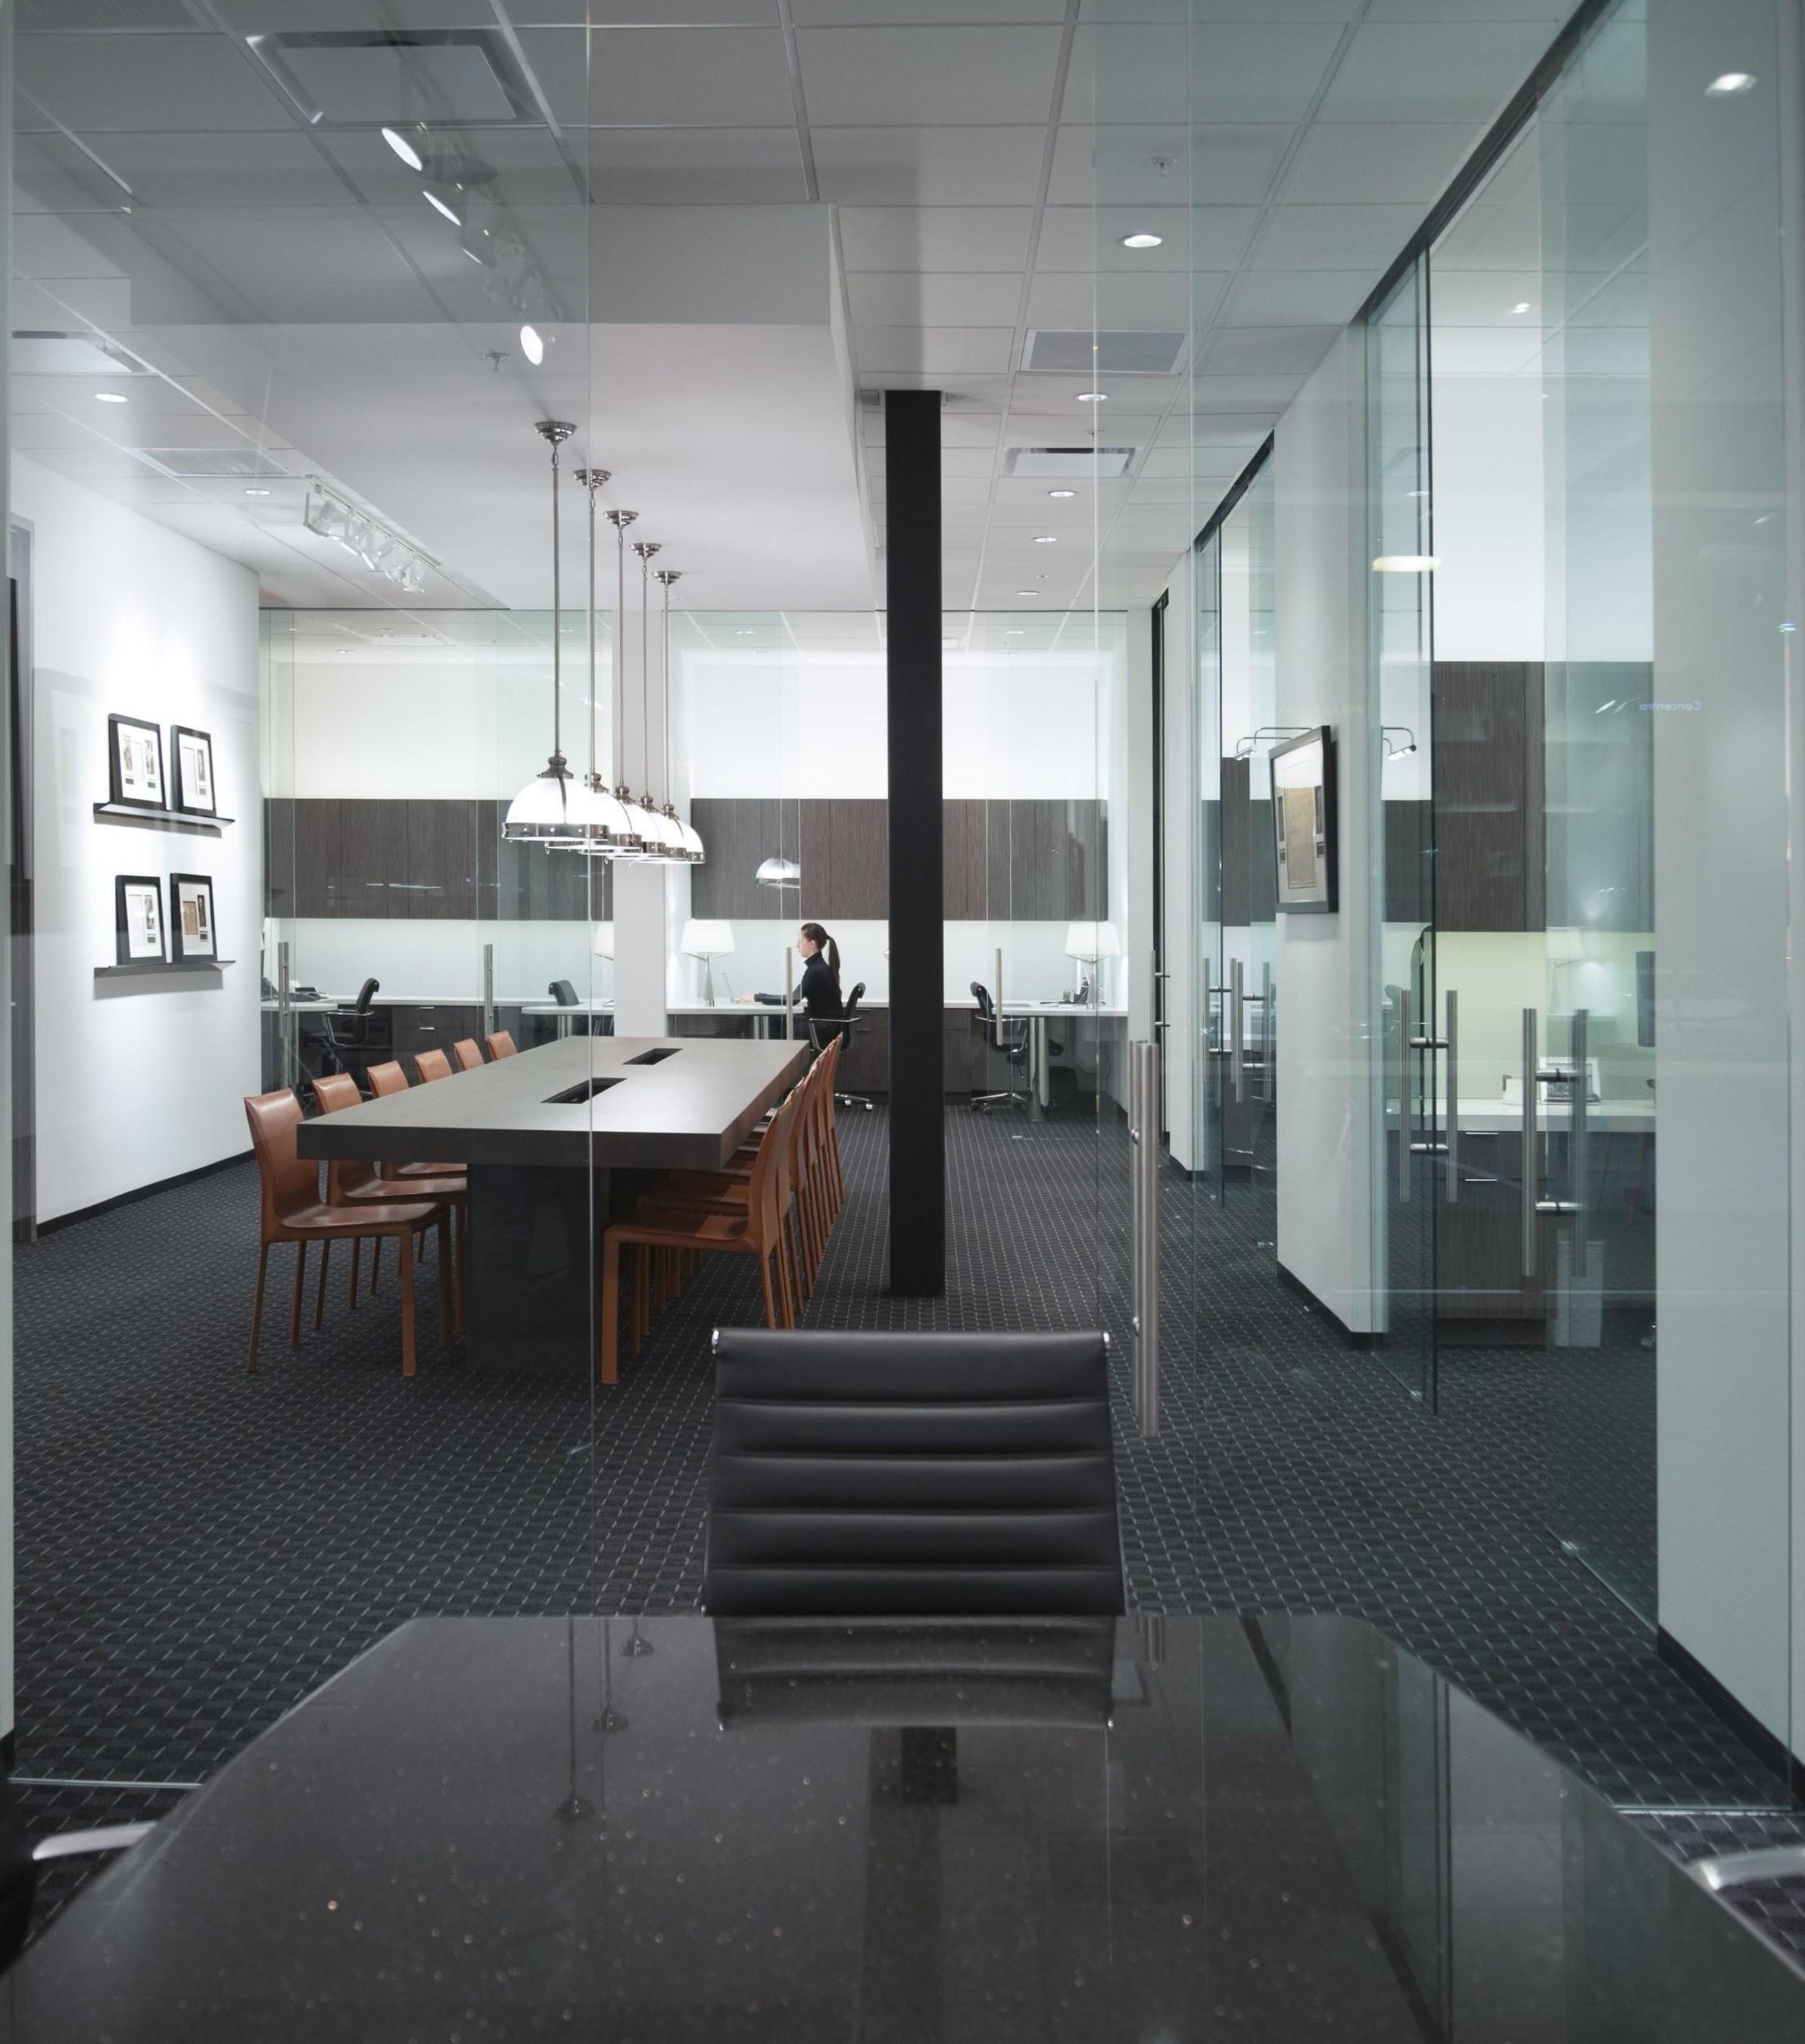 Entrepreneur Marc Sparks transforms office to optimize innovative collaboration